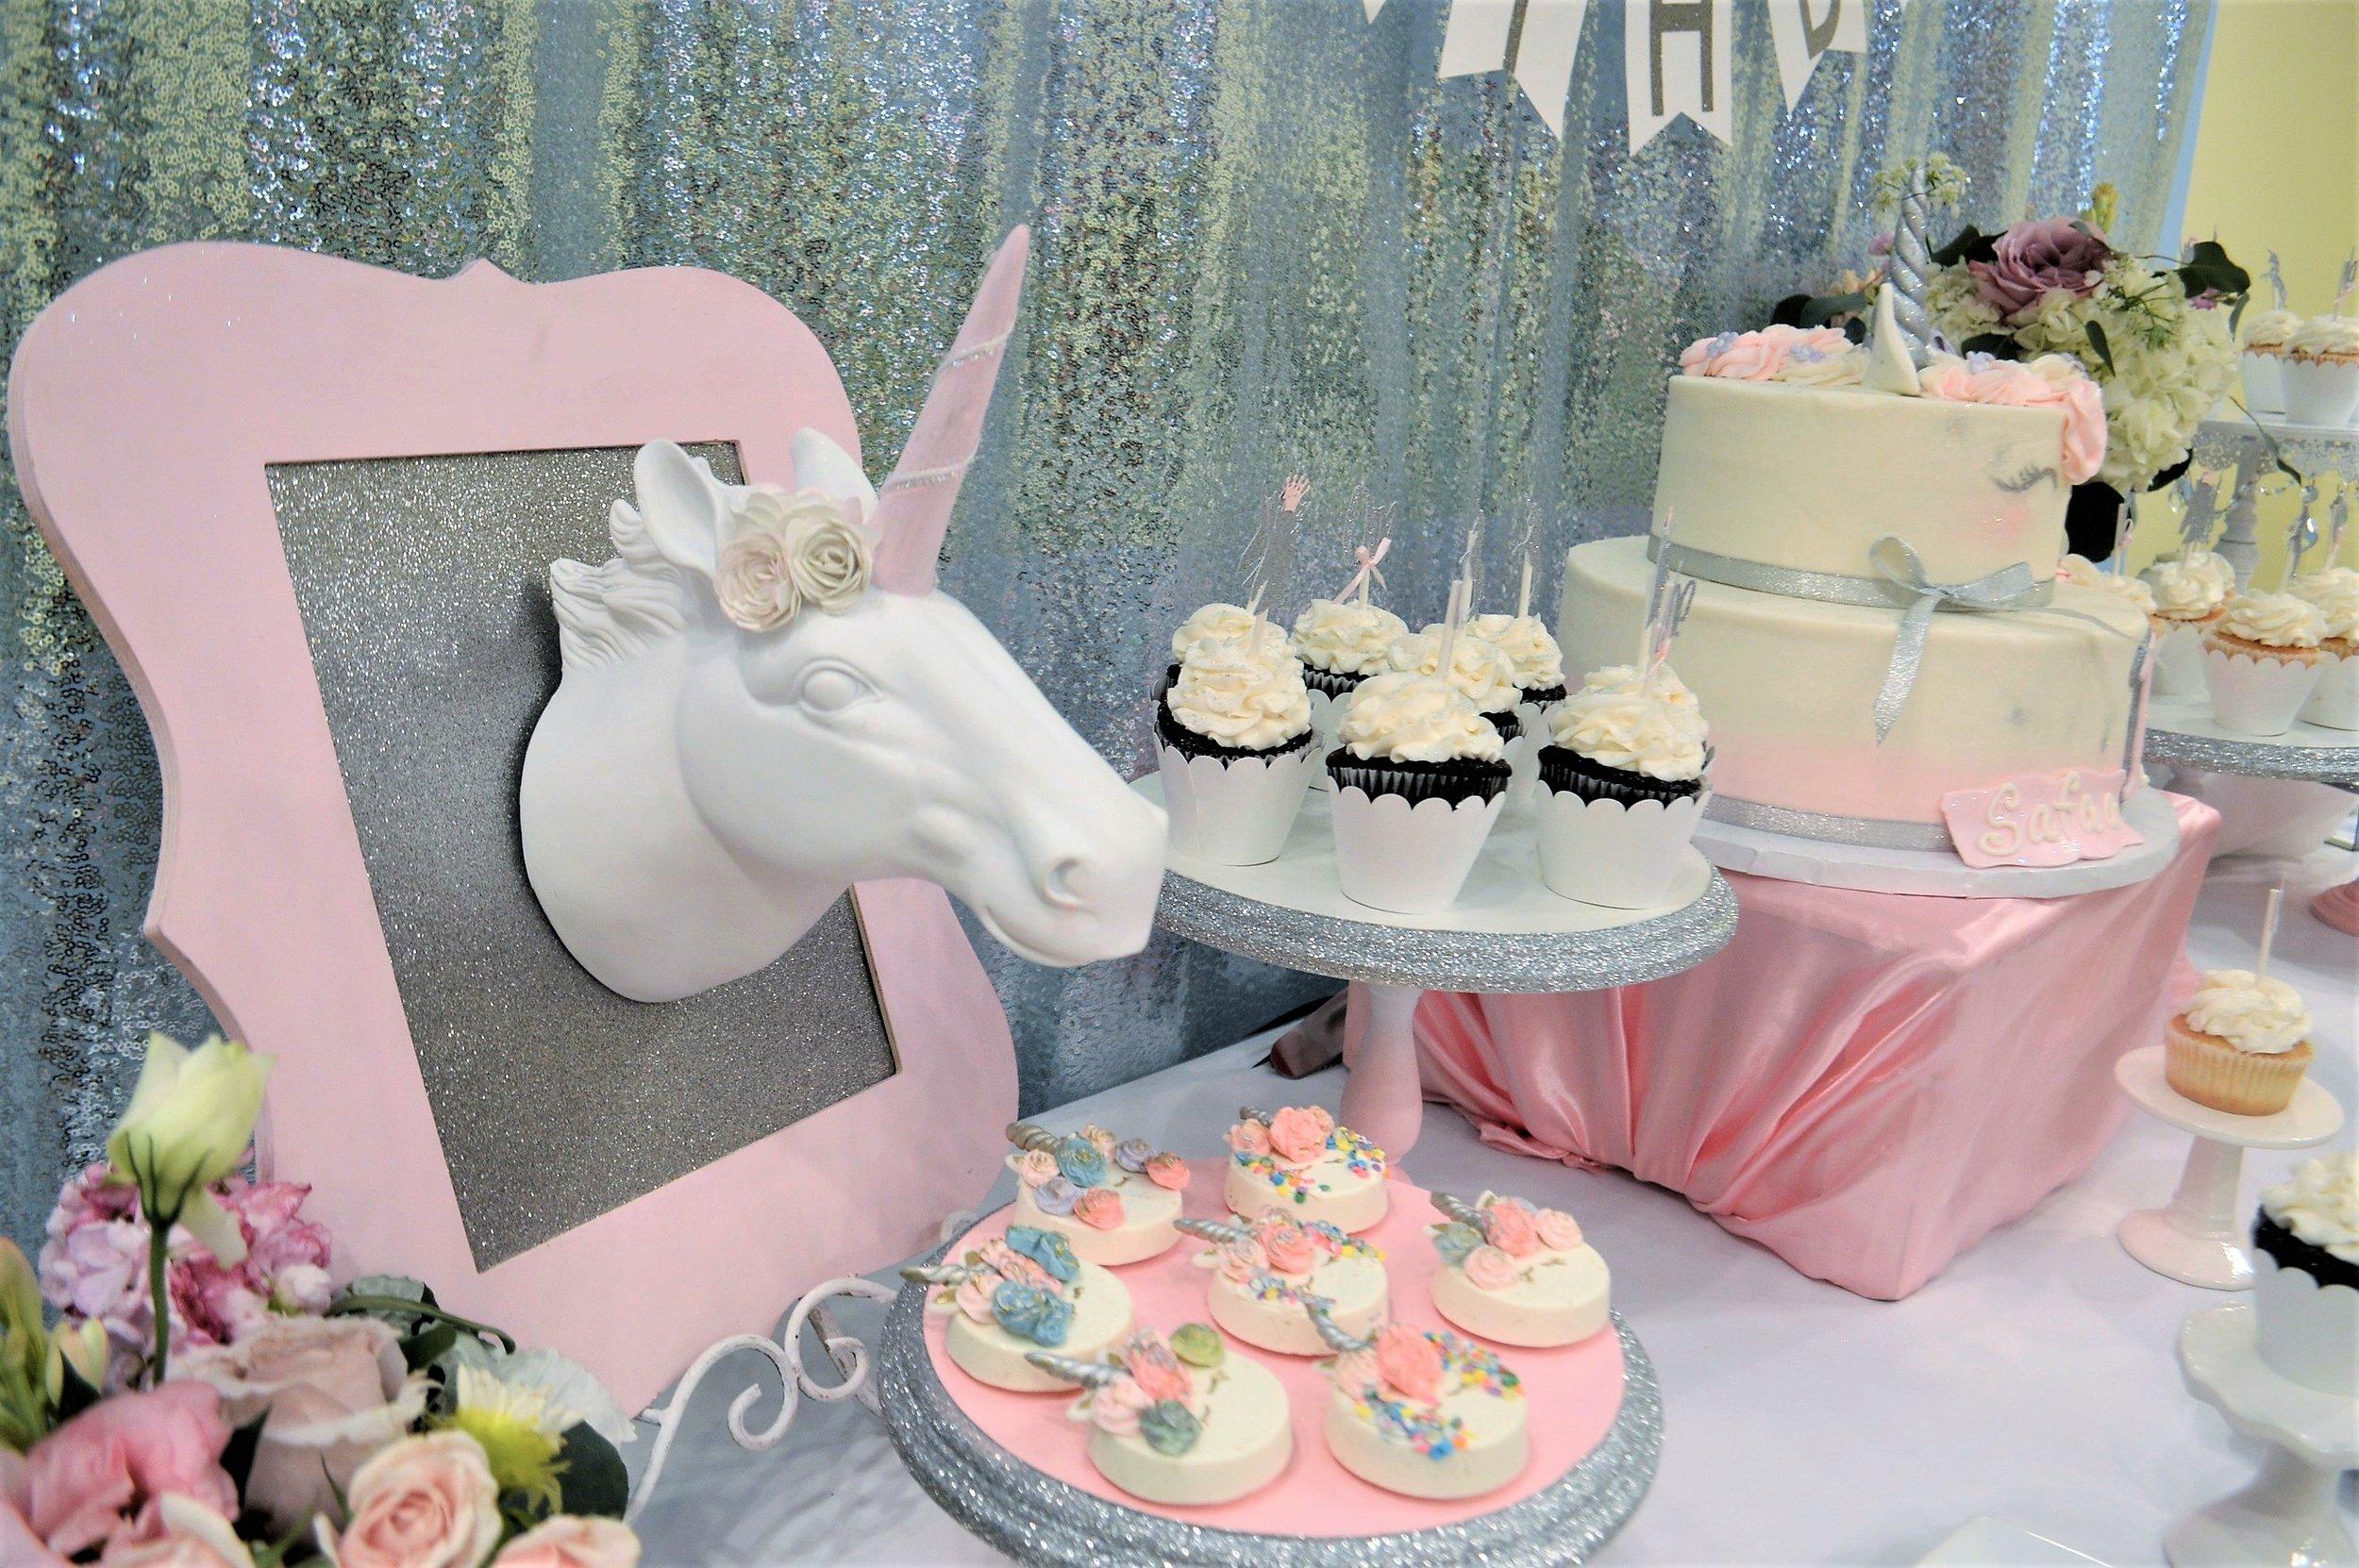 Unicorn birthday-unicorn party ideas-unicorn first birthday-unicorn party ideas-unicorn-unicorn first birthday party-unicorn cake-www.SugarPartiesLA.com.jpg